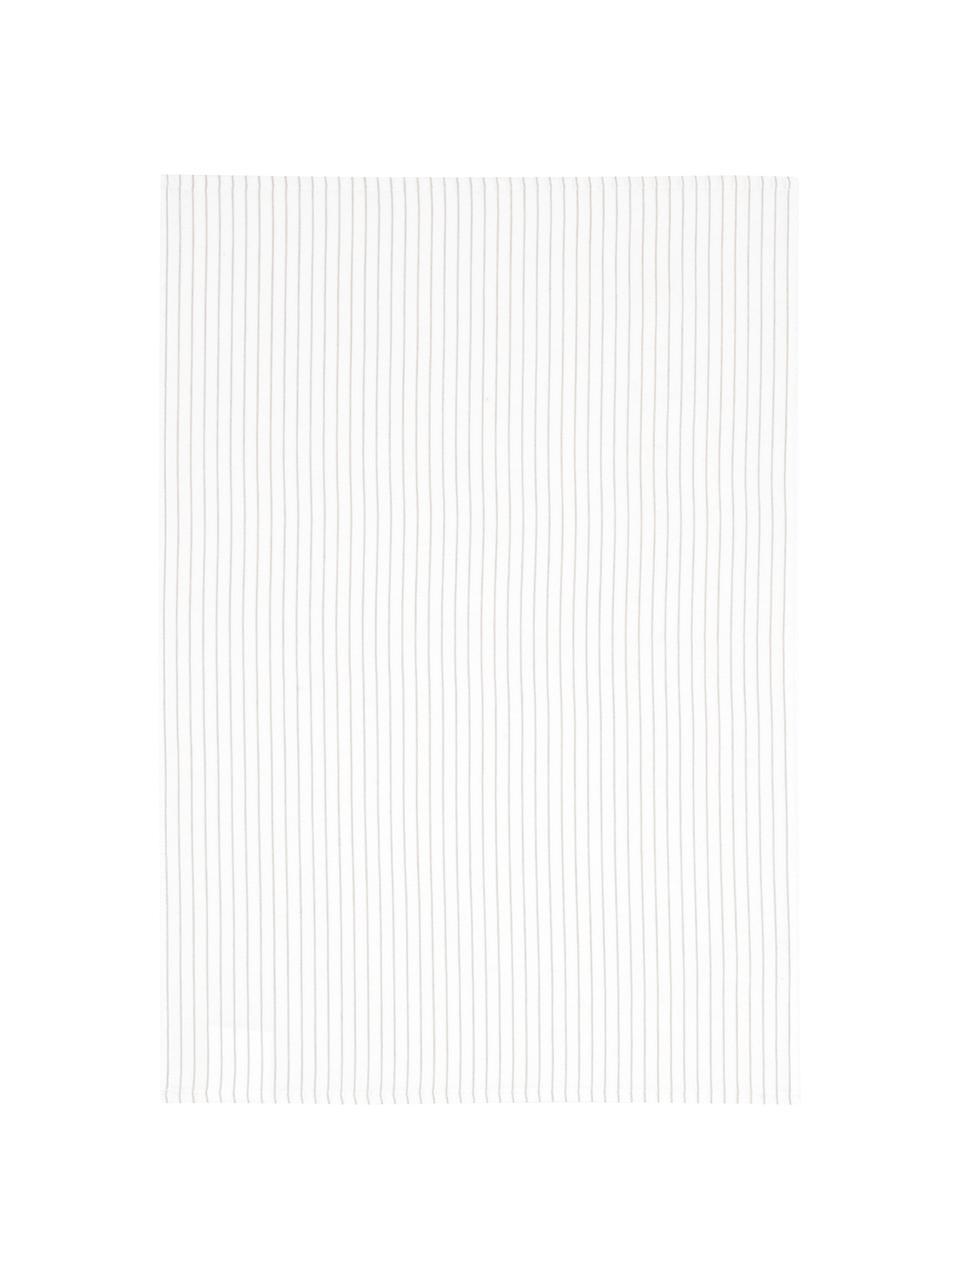 Canovacci Nicole 2 pz, Cotone, Bianco, beige, Larg. 50 x Lung. 70 cm